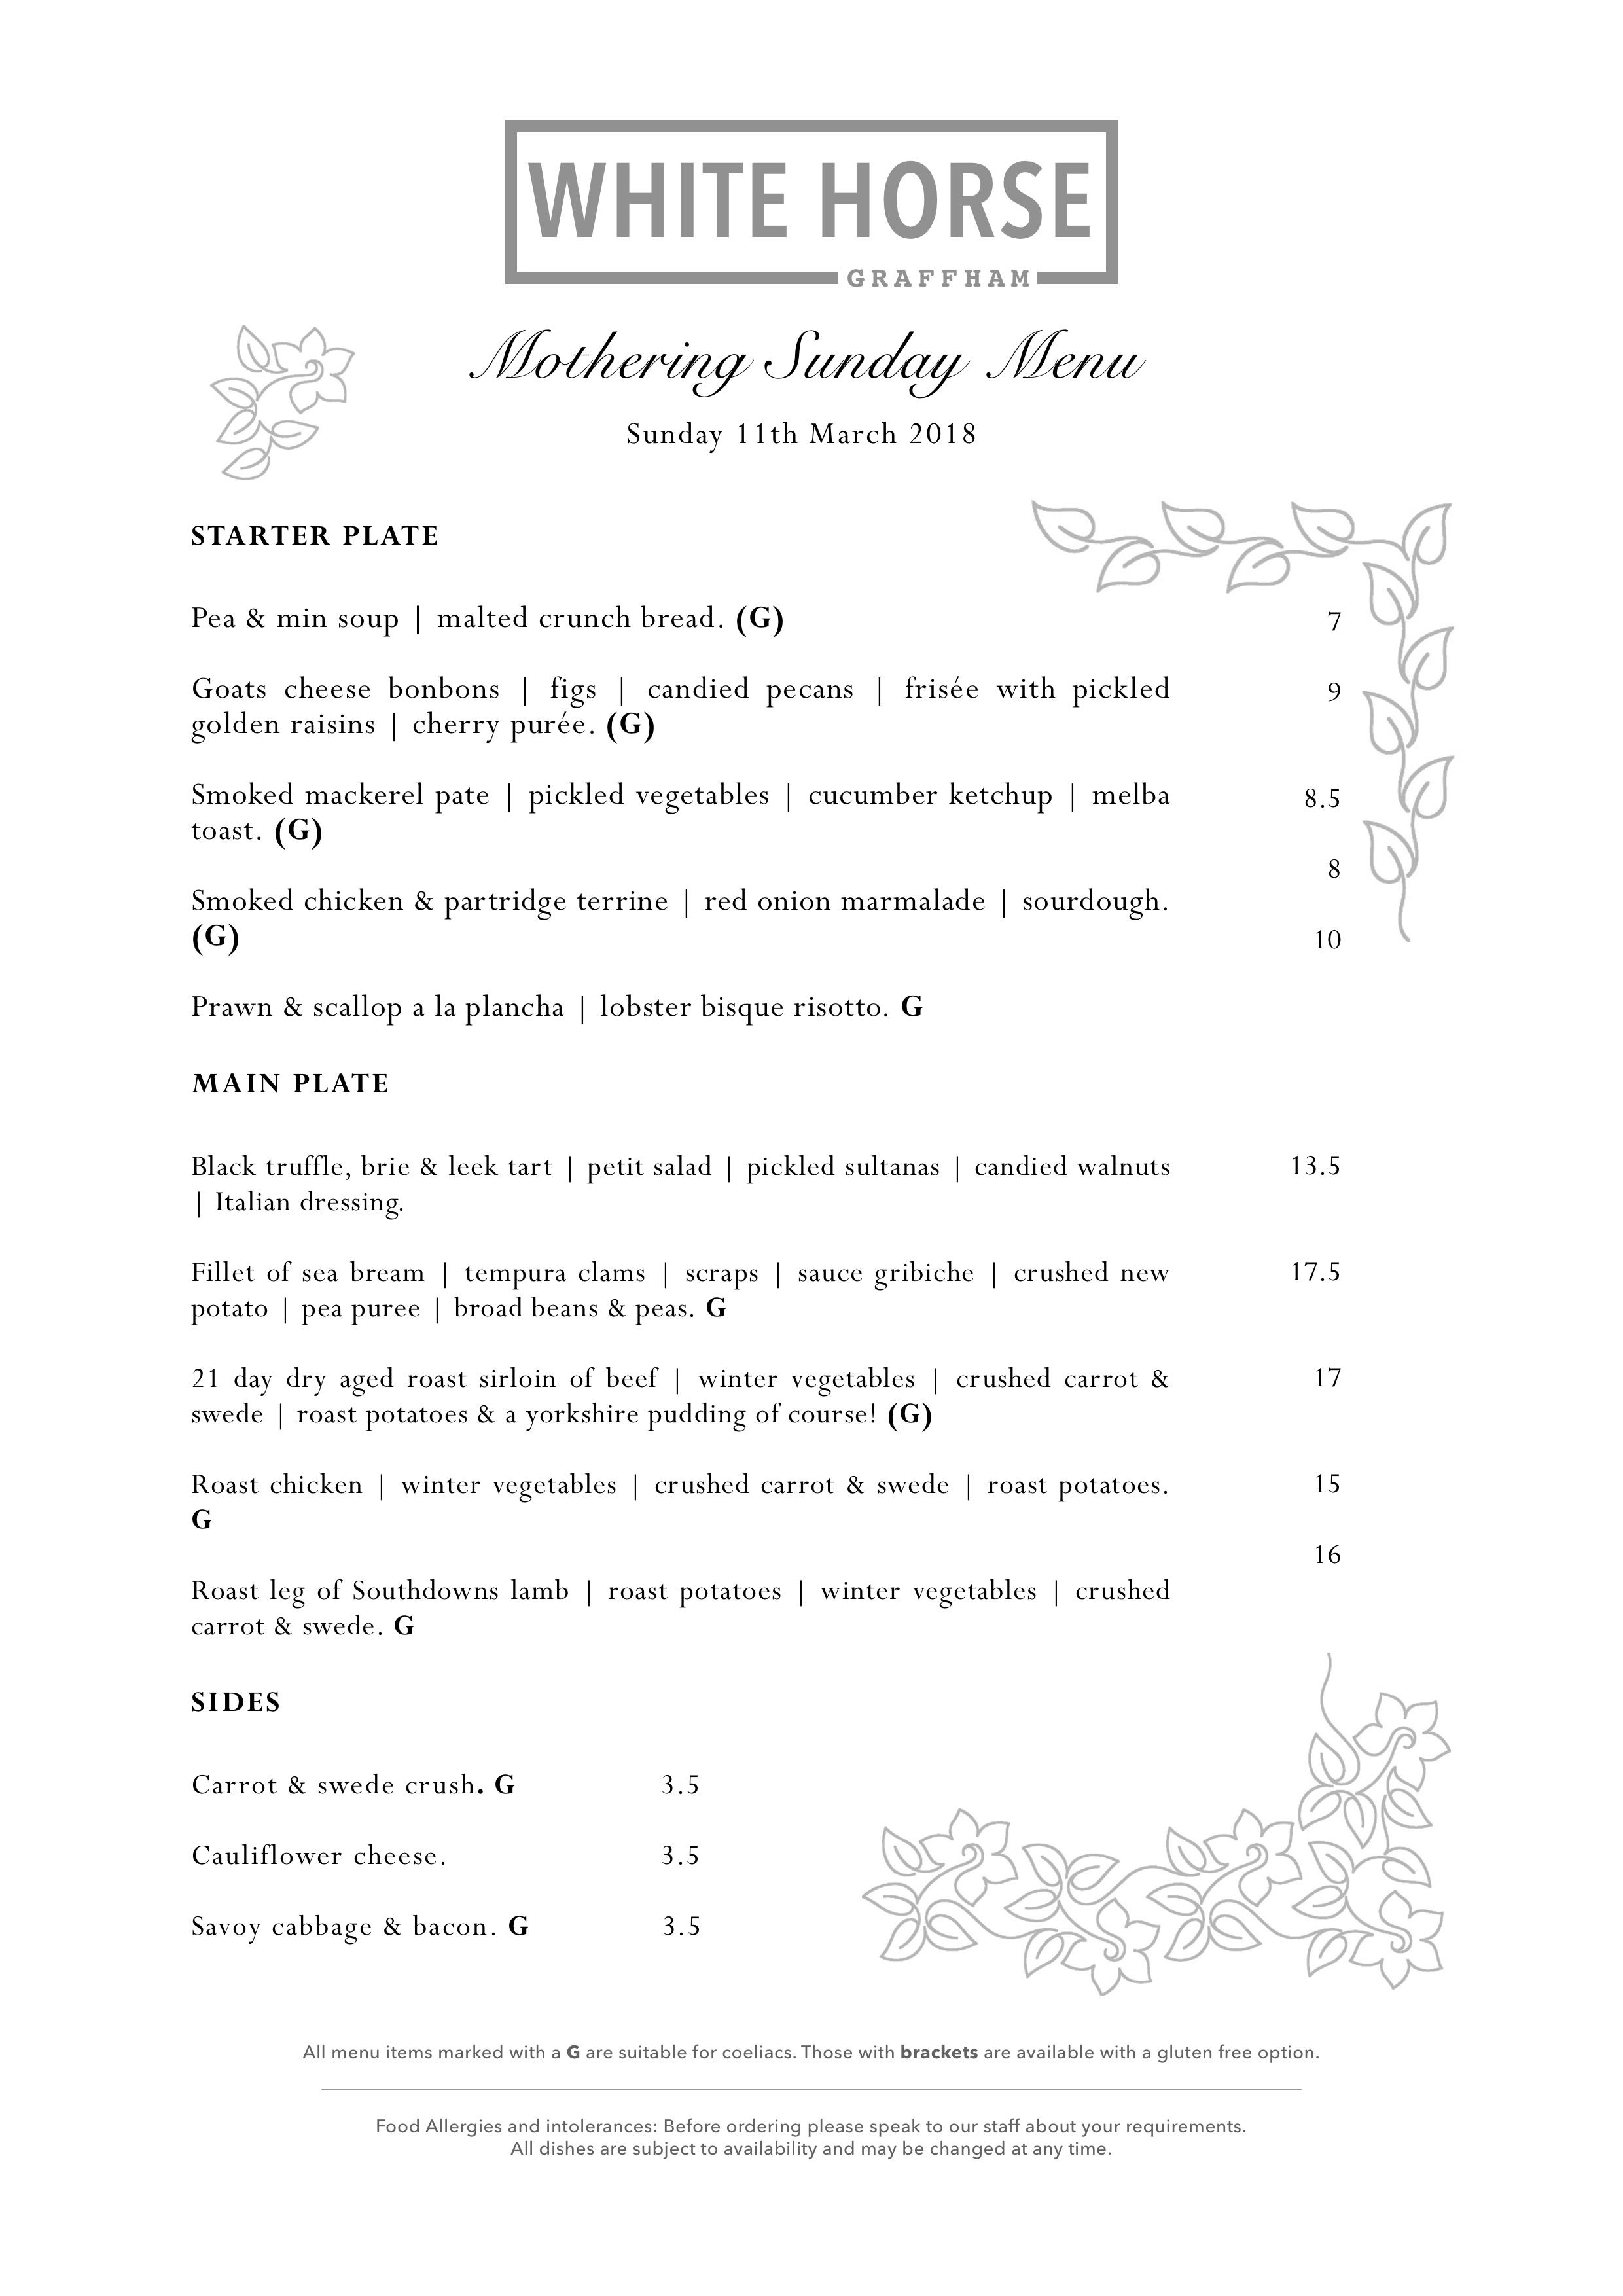 mothering sunday whg menu.jpg